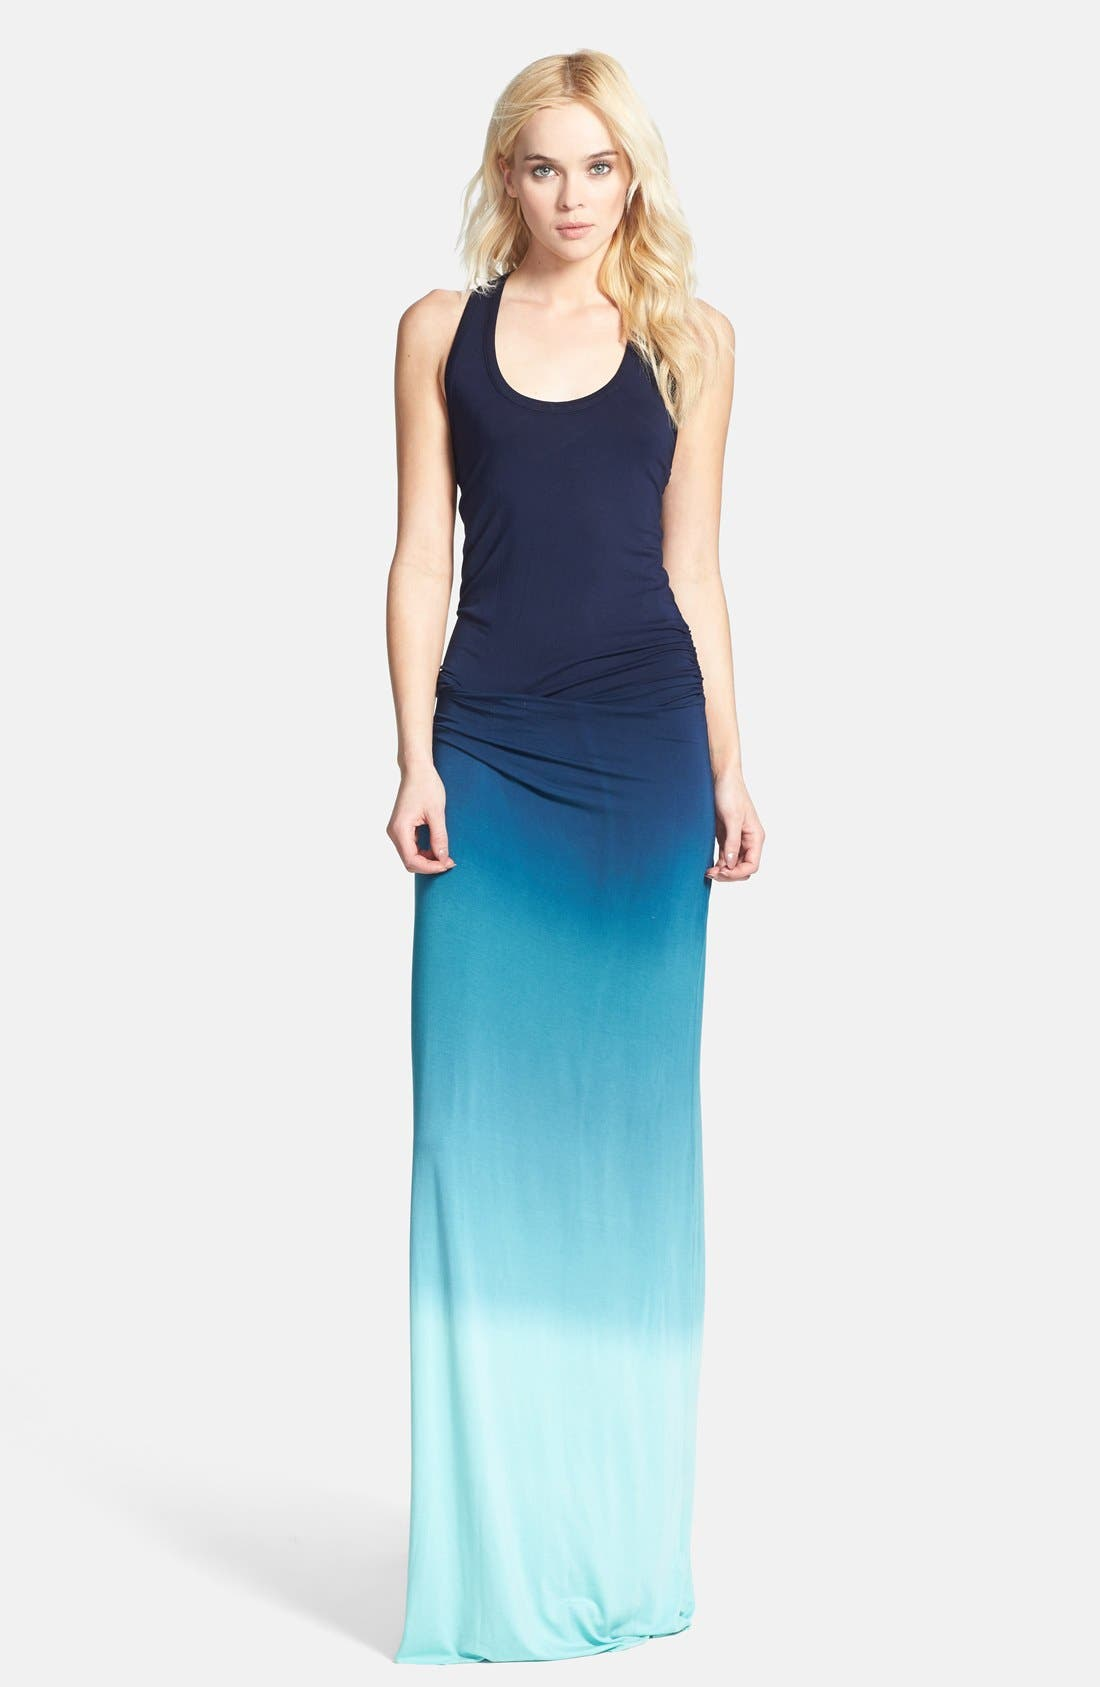 Alternate Image 1 Selected - Young, Fabulous & Broke 'Hamptons' Racerback Jersey Maxi Dress